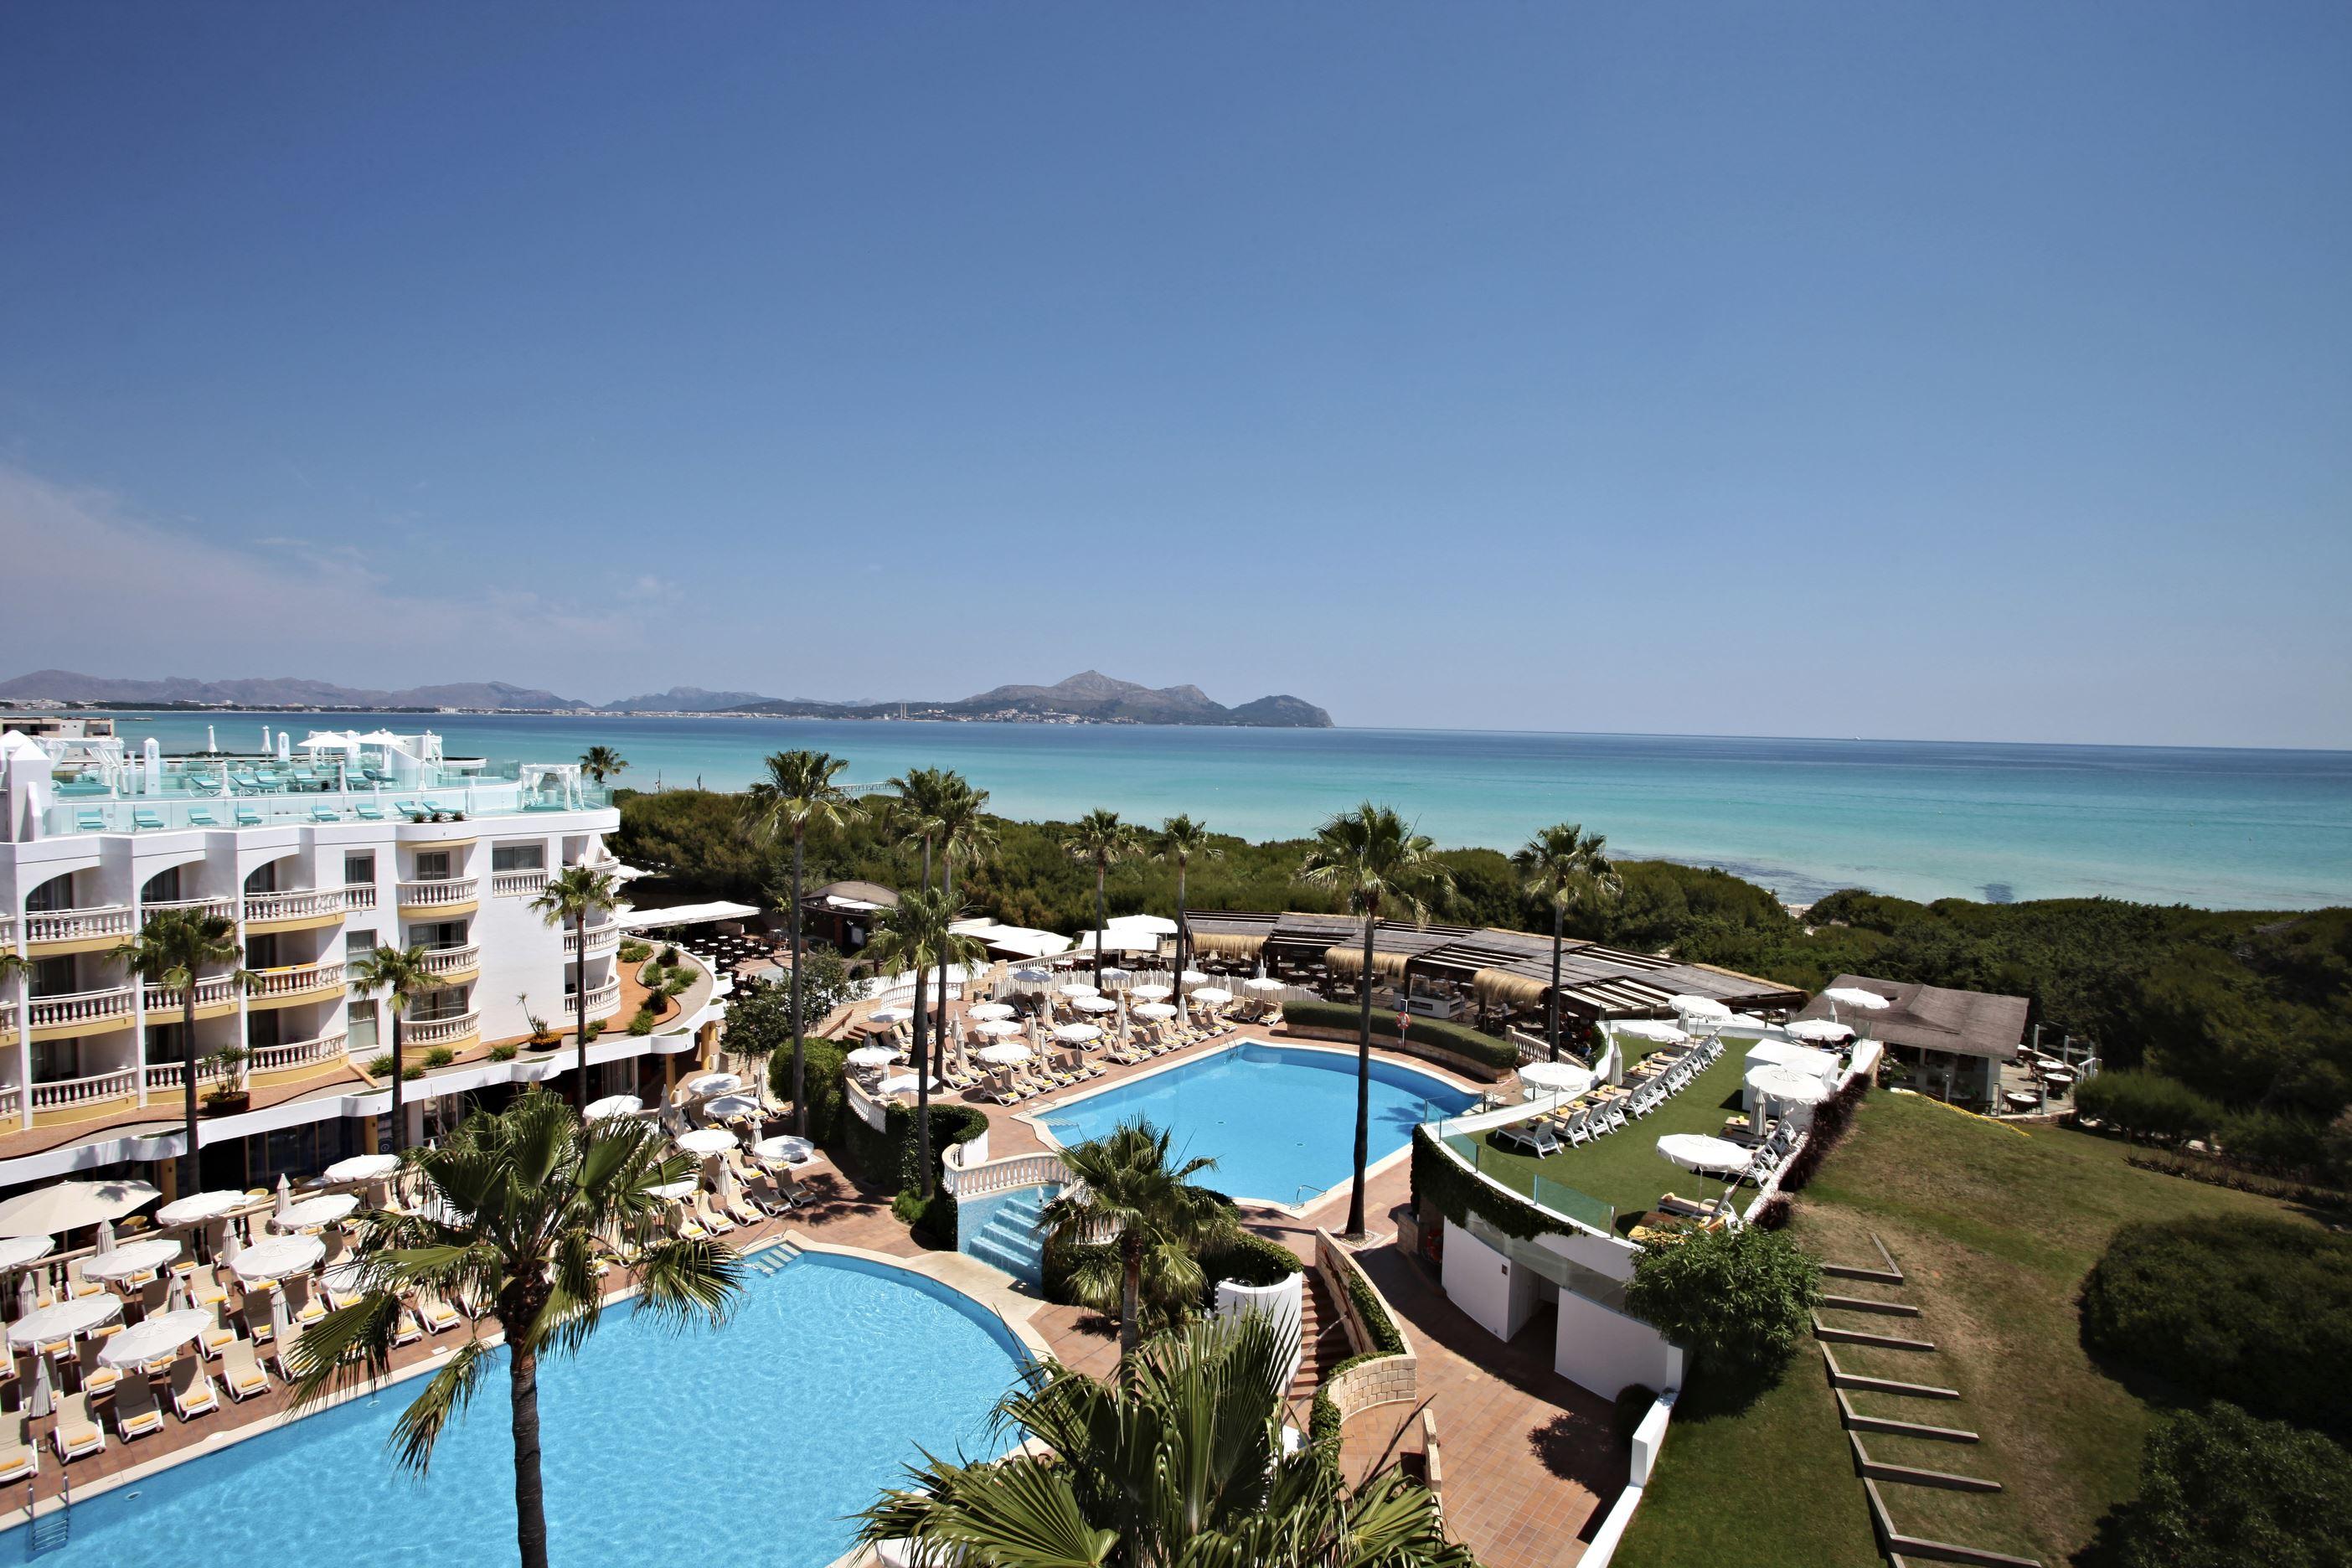 Iberostar Albufera Playa: Direkt strandläge i Alcudia – Halvpension ingår!